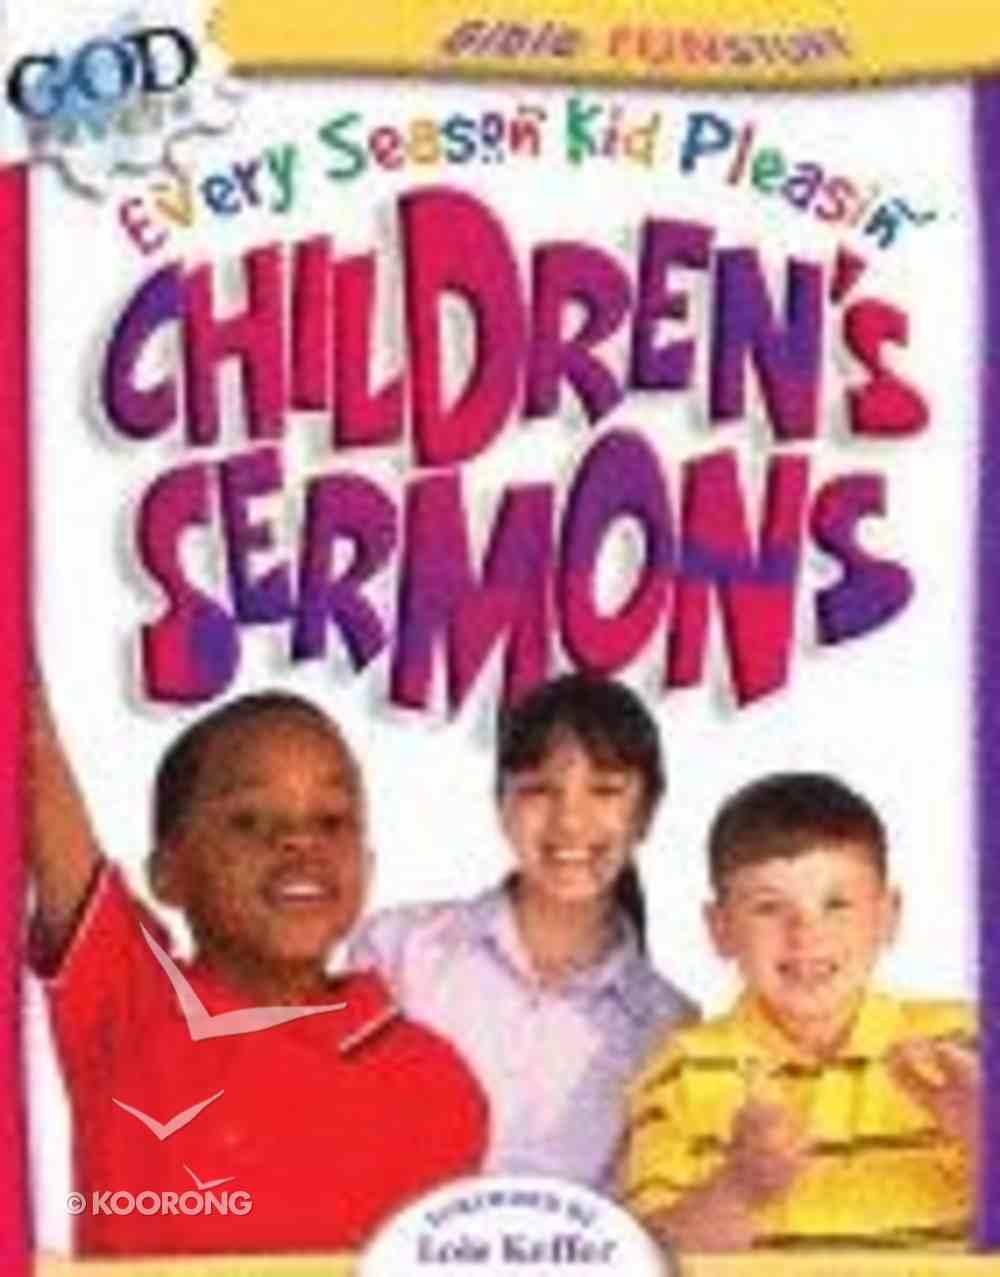 Every Season Kid Pleasin' Children's Sermons (Godprints Bible Fun Stuff Series) Paperback